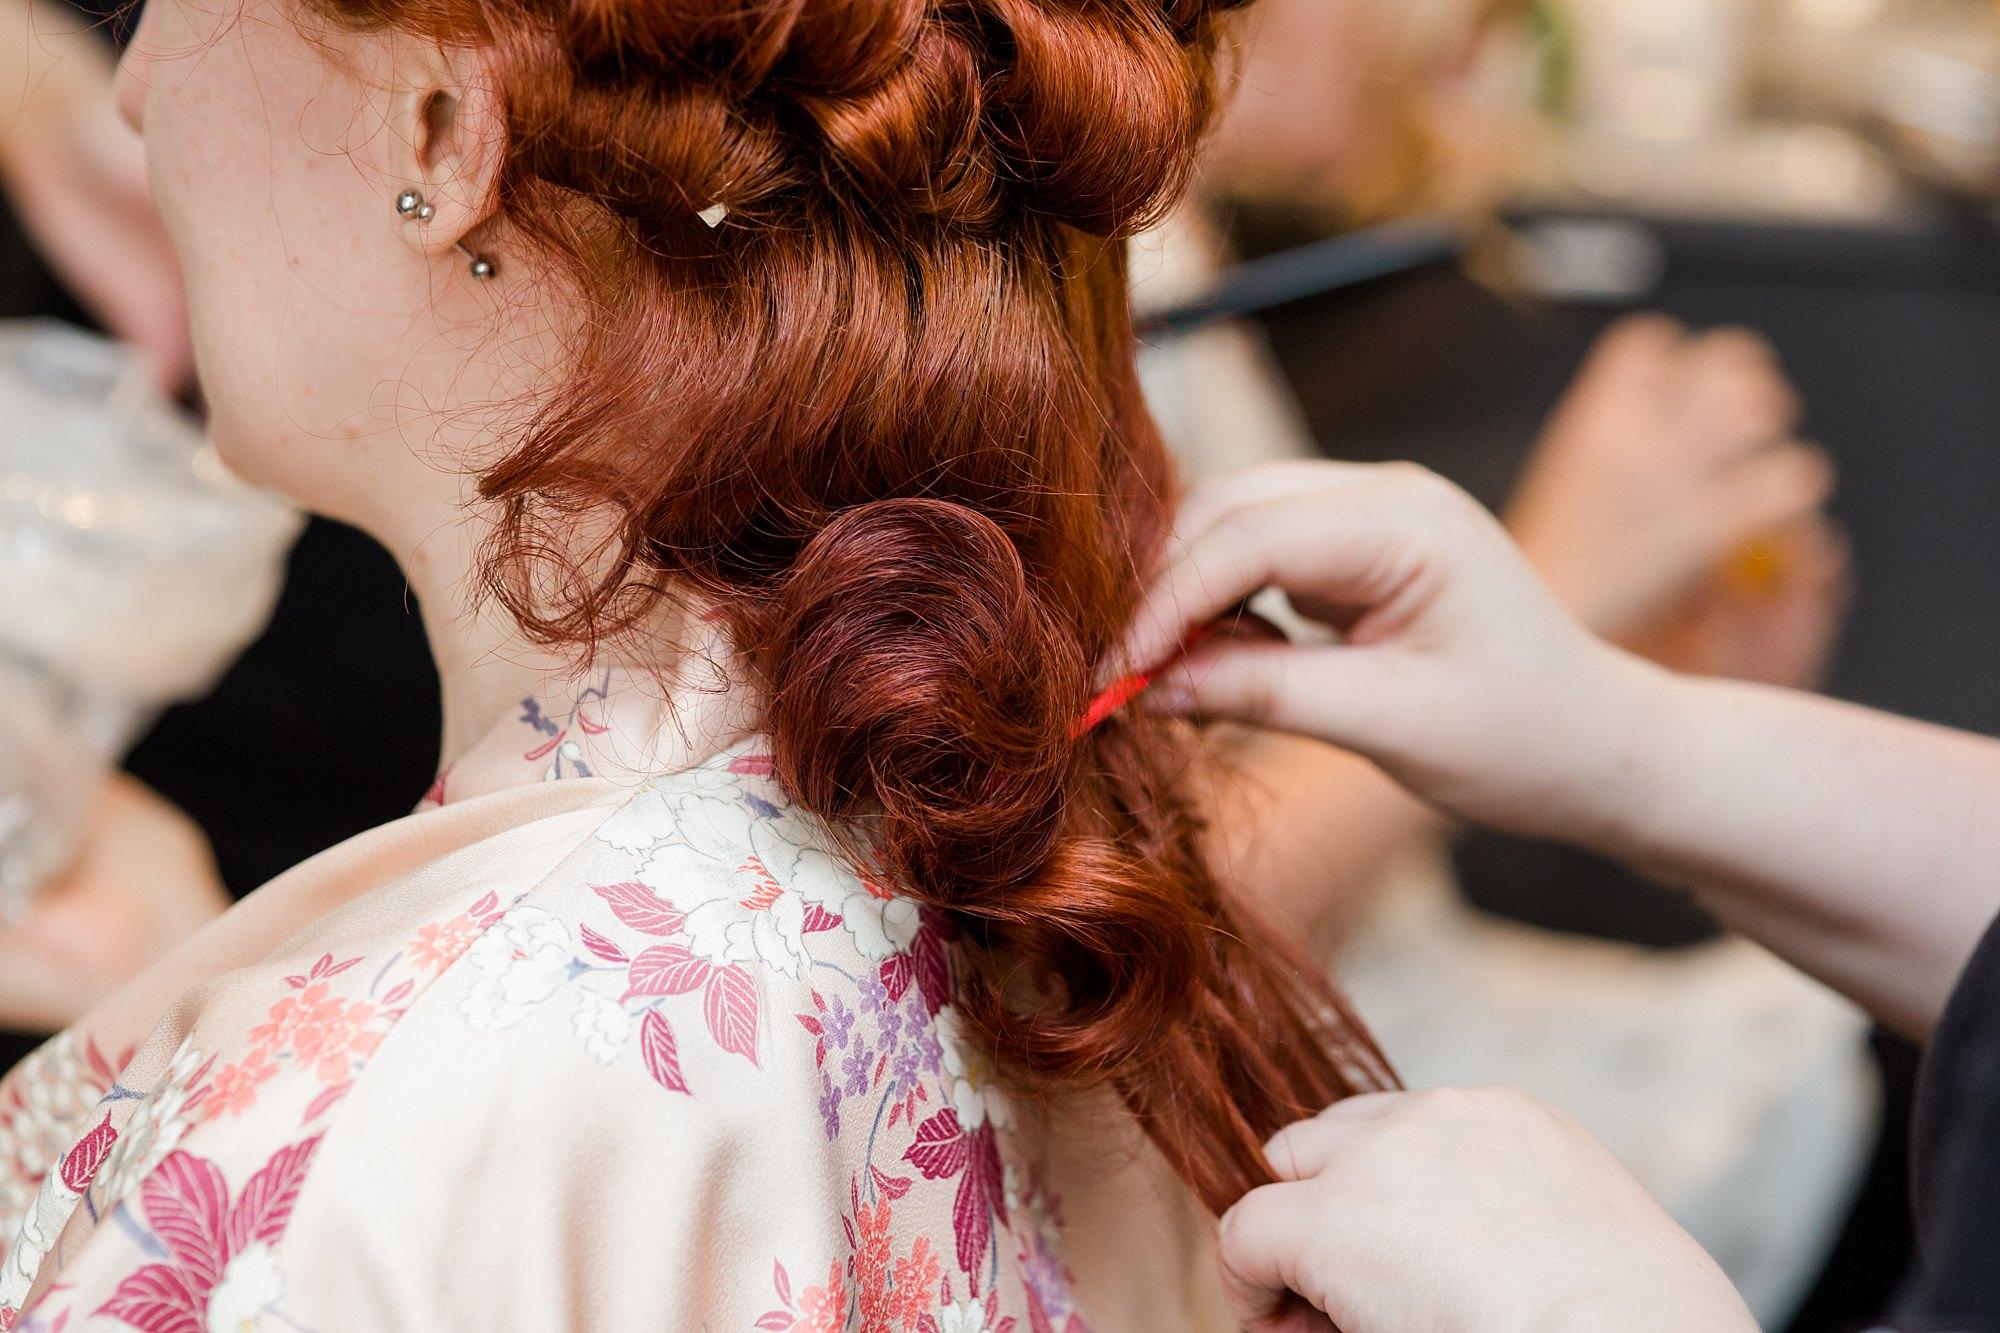 The Grange Ealing wedding bride had vintage curls brushed out